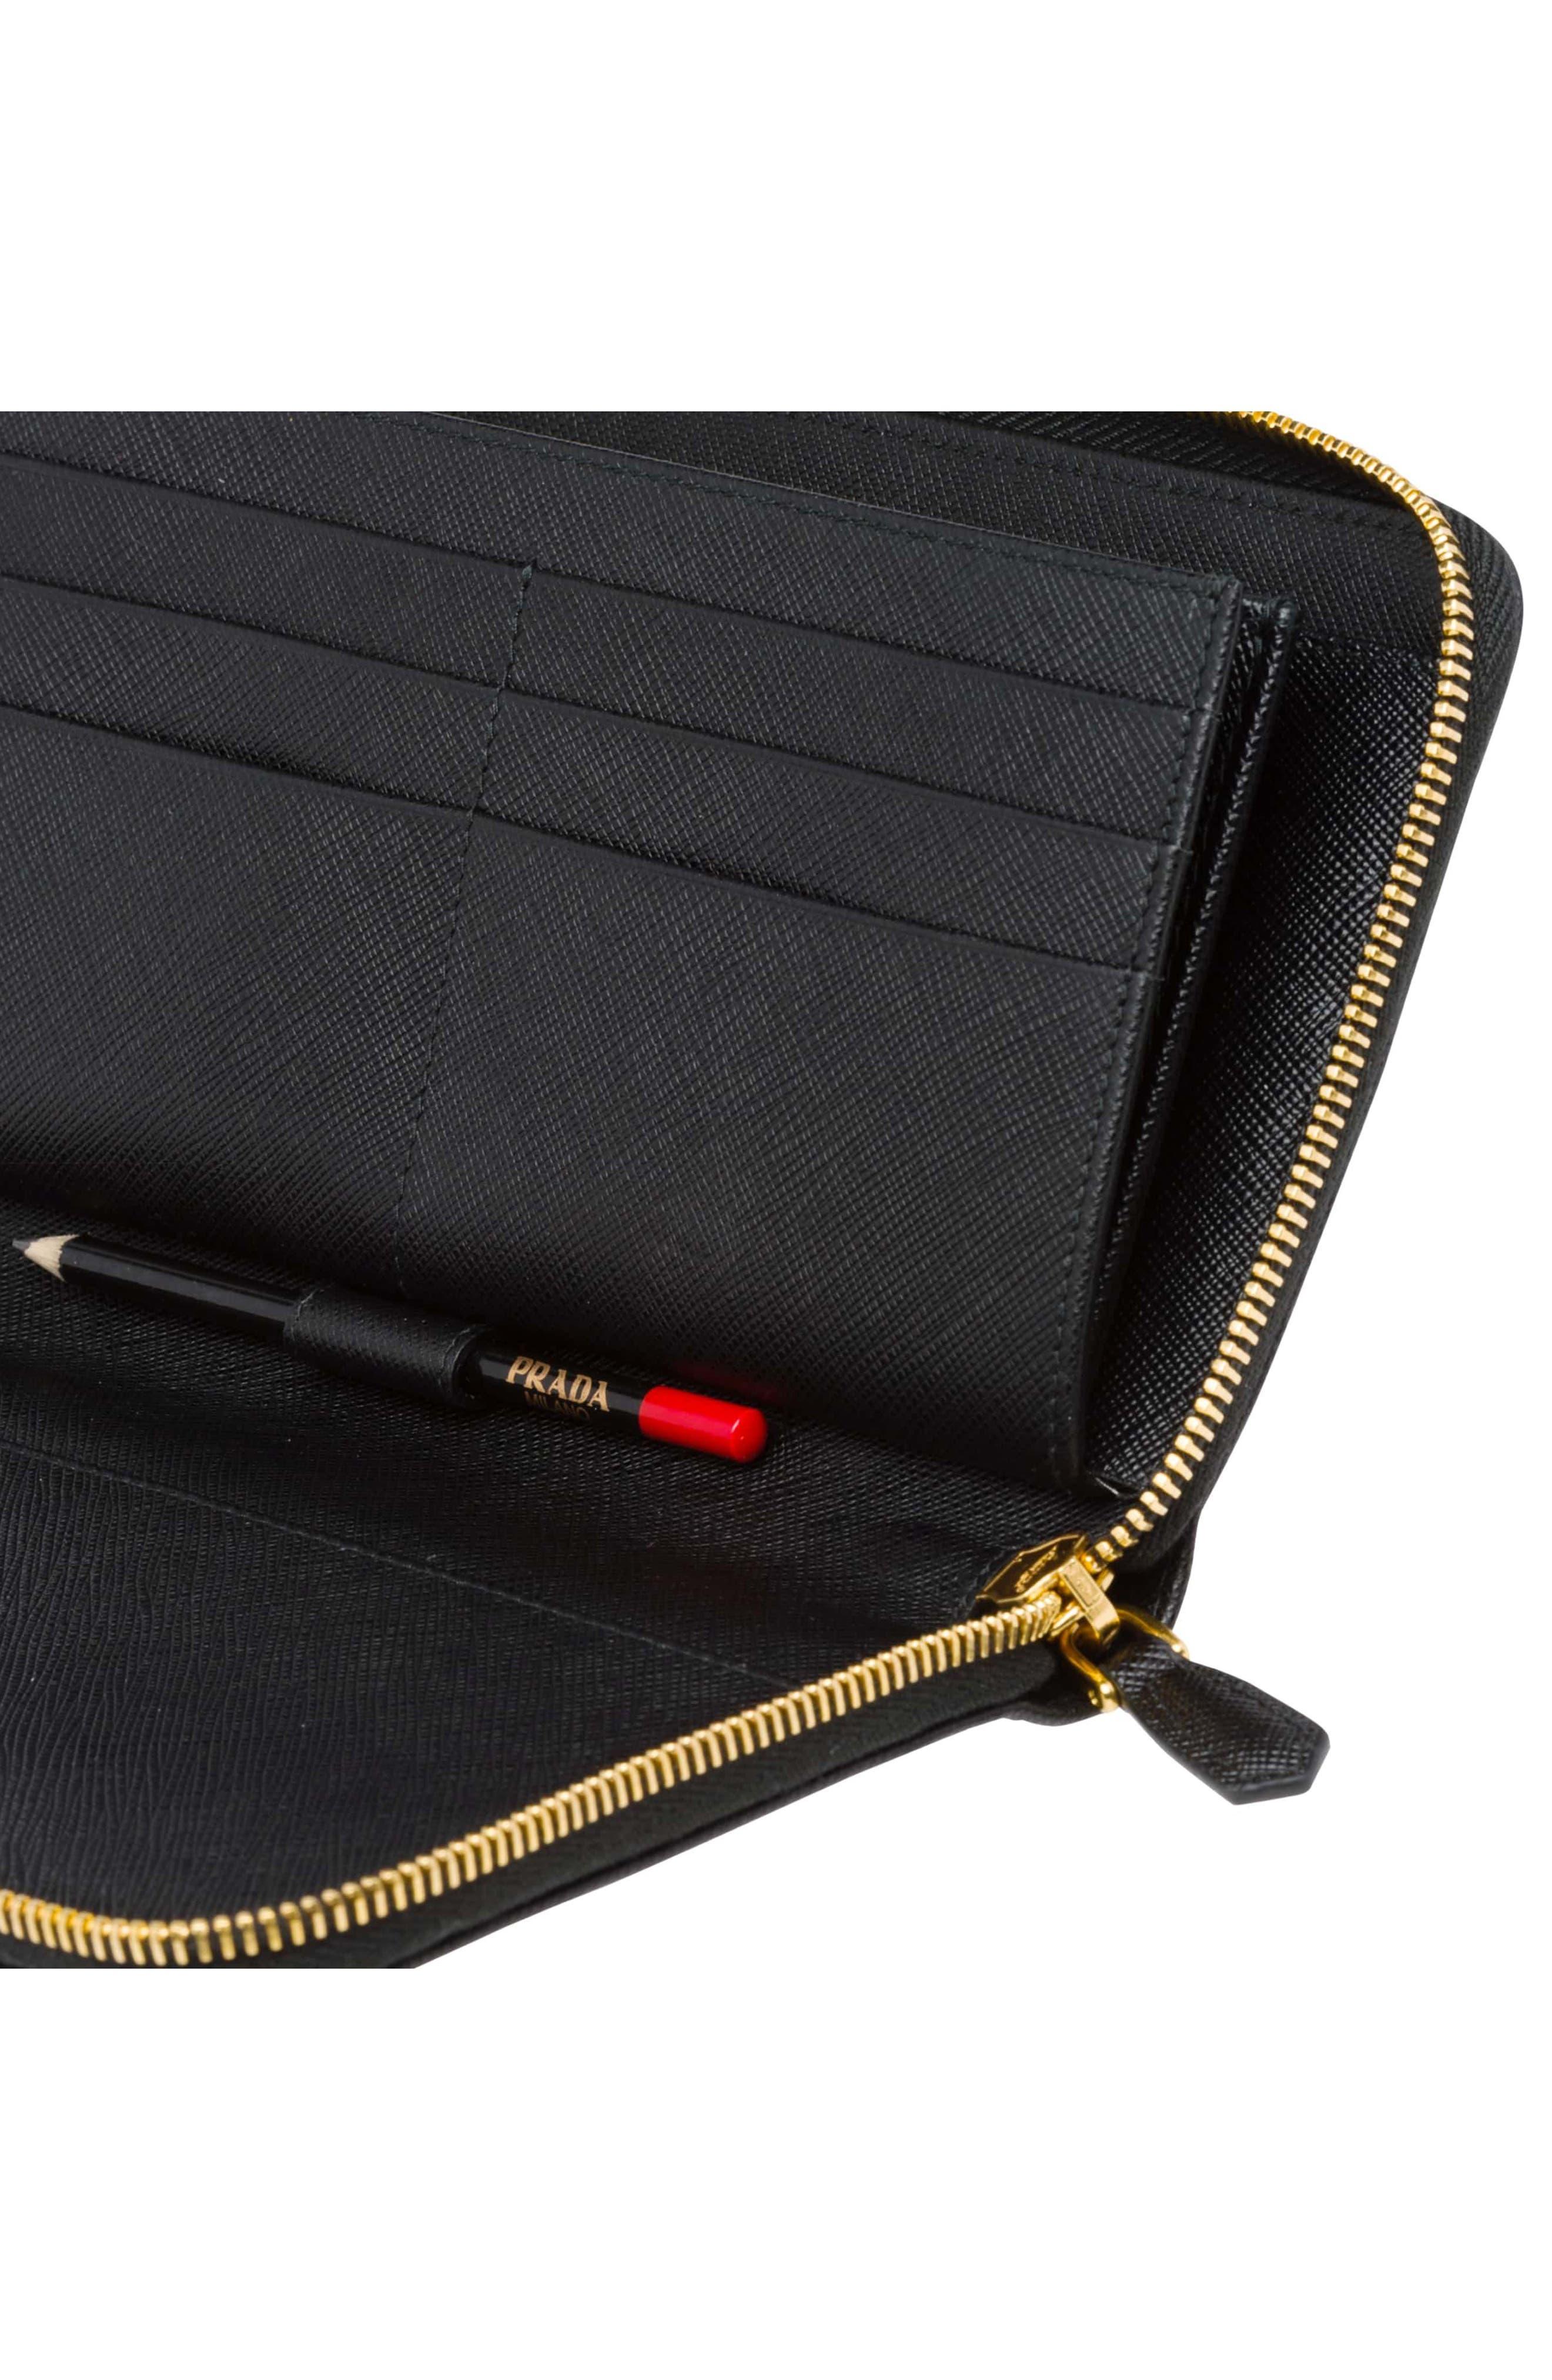 Oro Saffiano Leather Zip Around Wallet,                             Alternate thumbnail 4, color,                             001